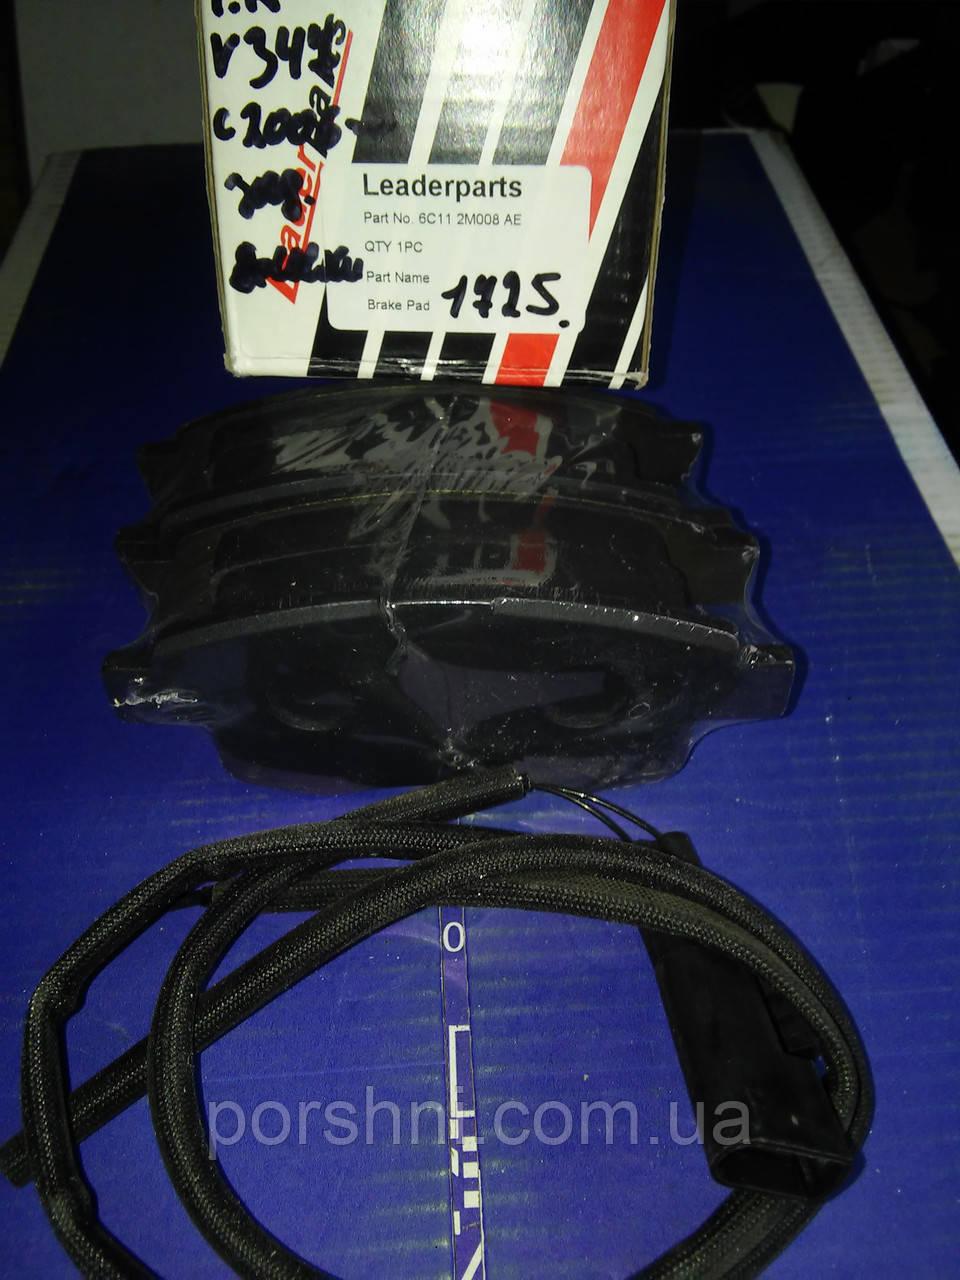 Колодки задні Форд Транзит 2006 -- V347 Leaderparts GDB1725. 6C112M008AE